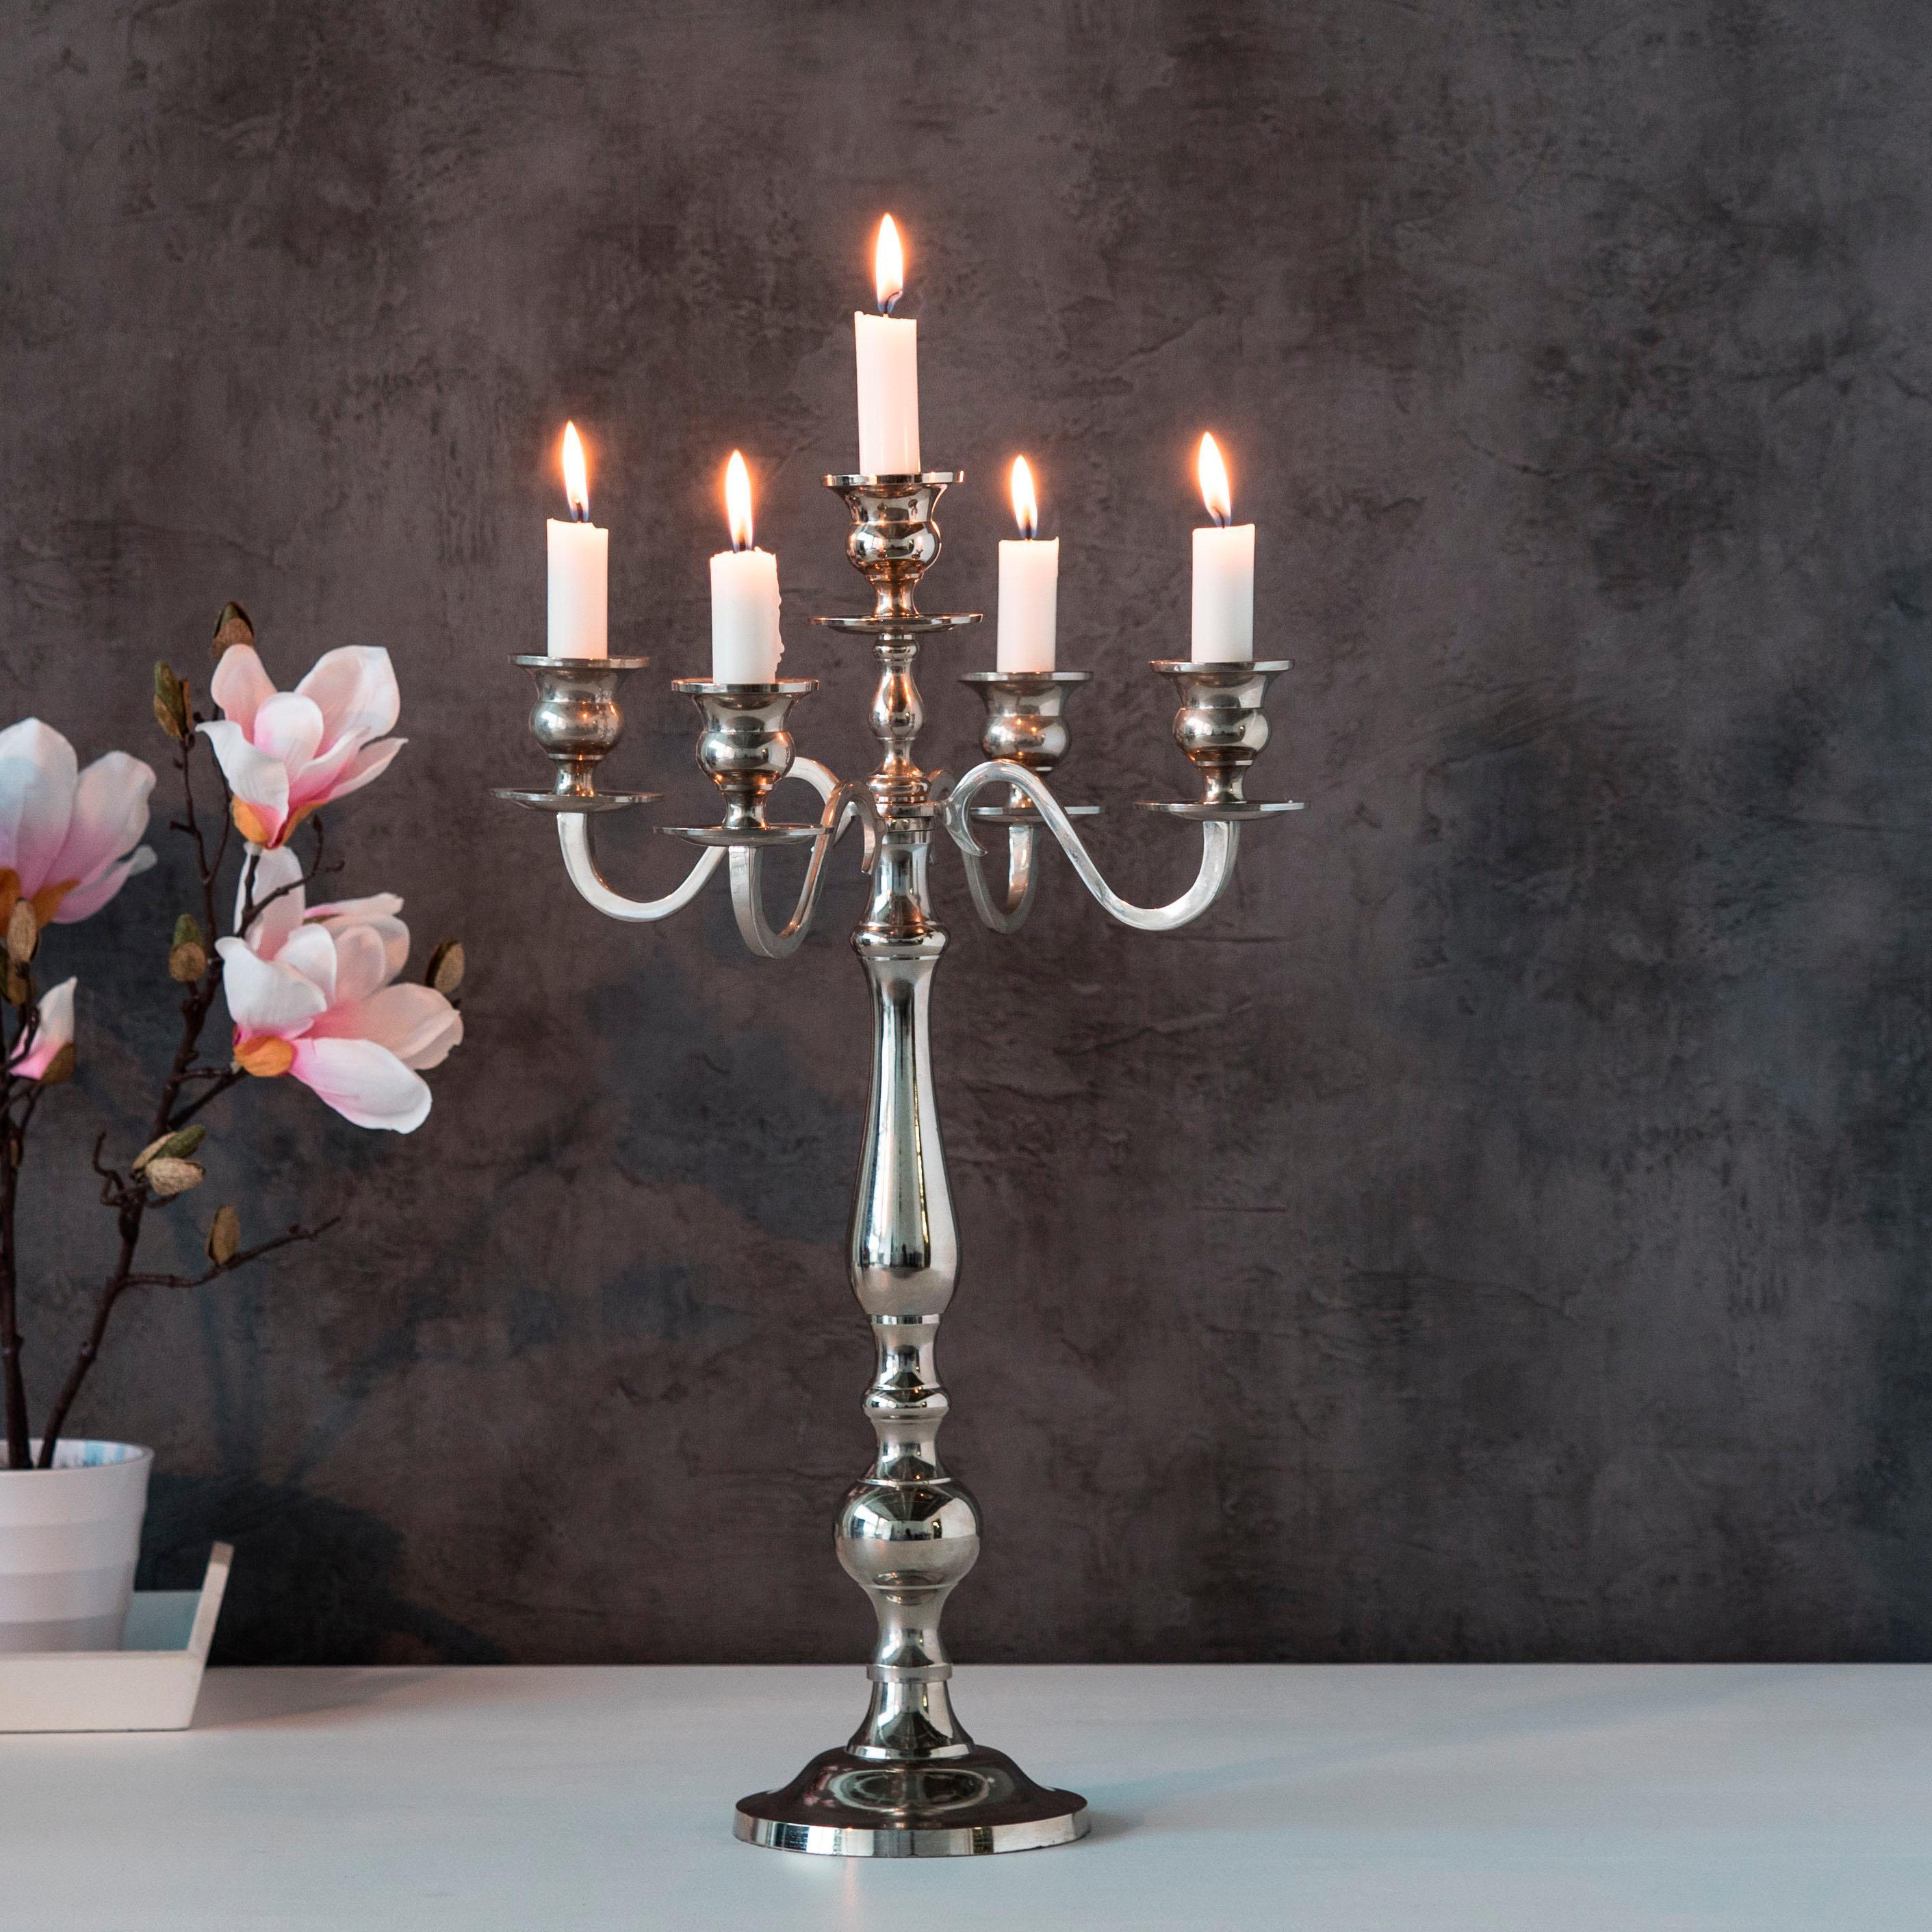 home affaire kerzenleuchter varas f r 5 kerzen h he 35. Black Bedroom Furniture Sets. Home Design Ideas